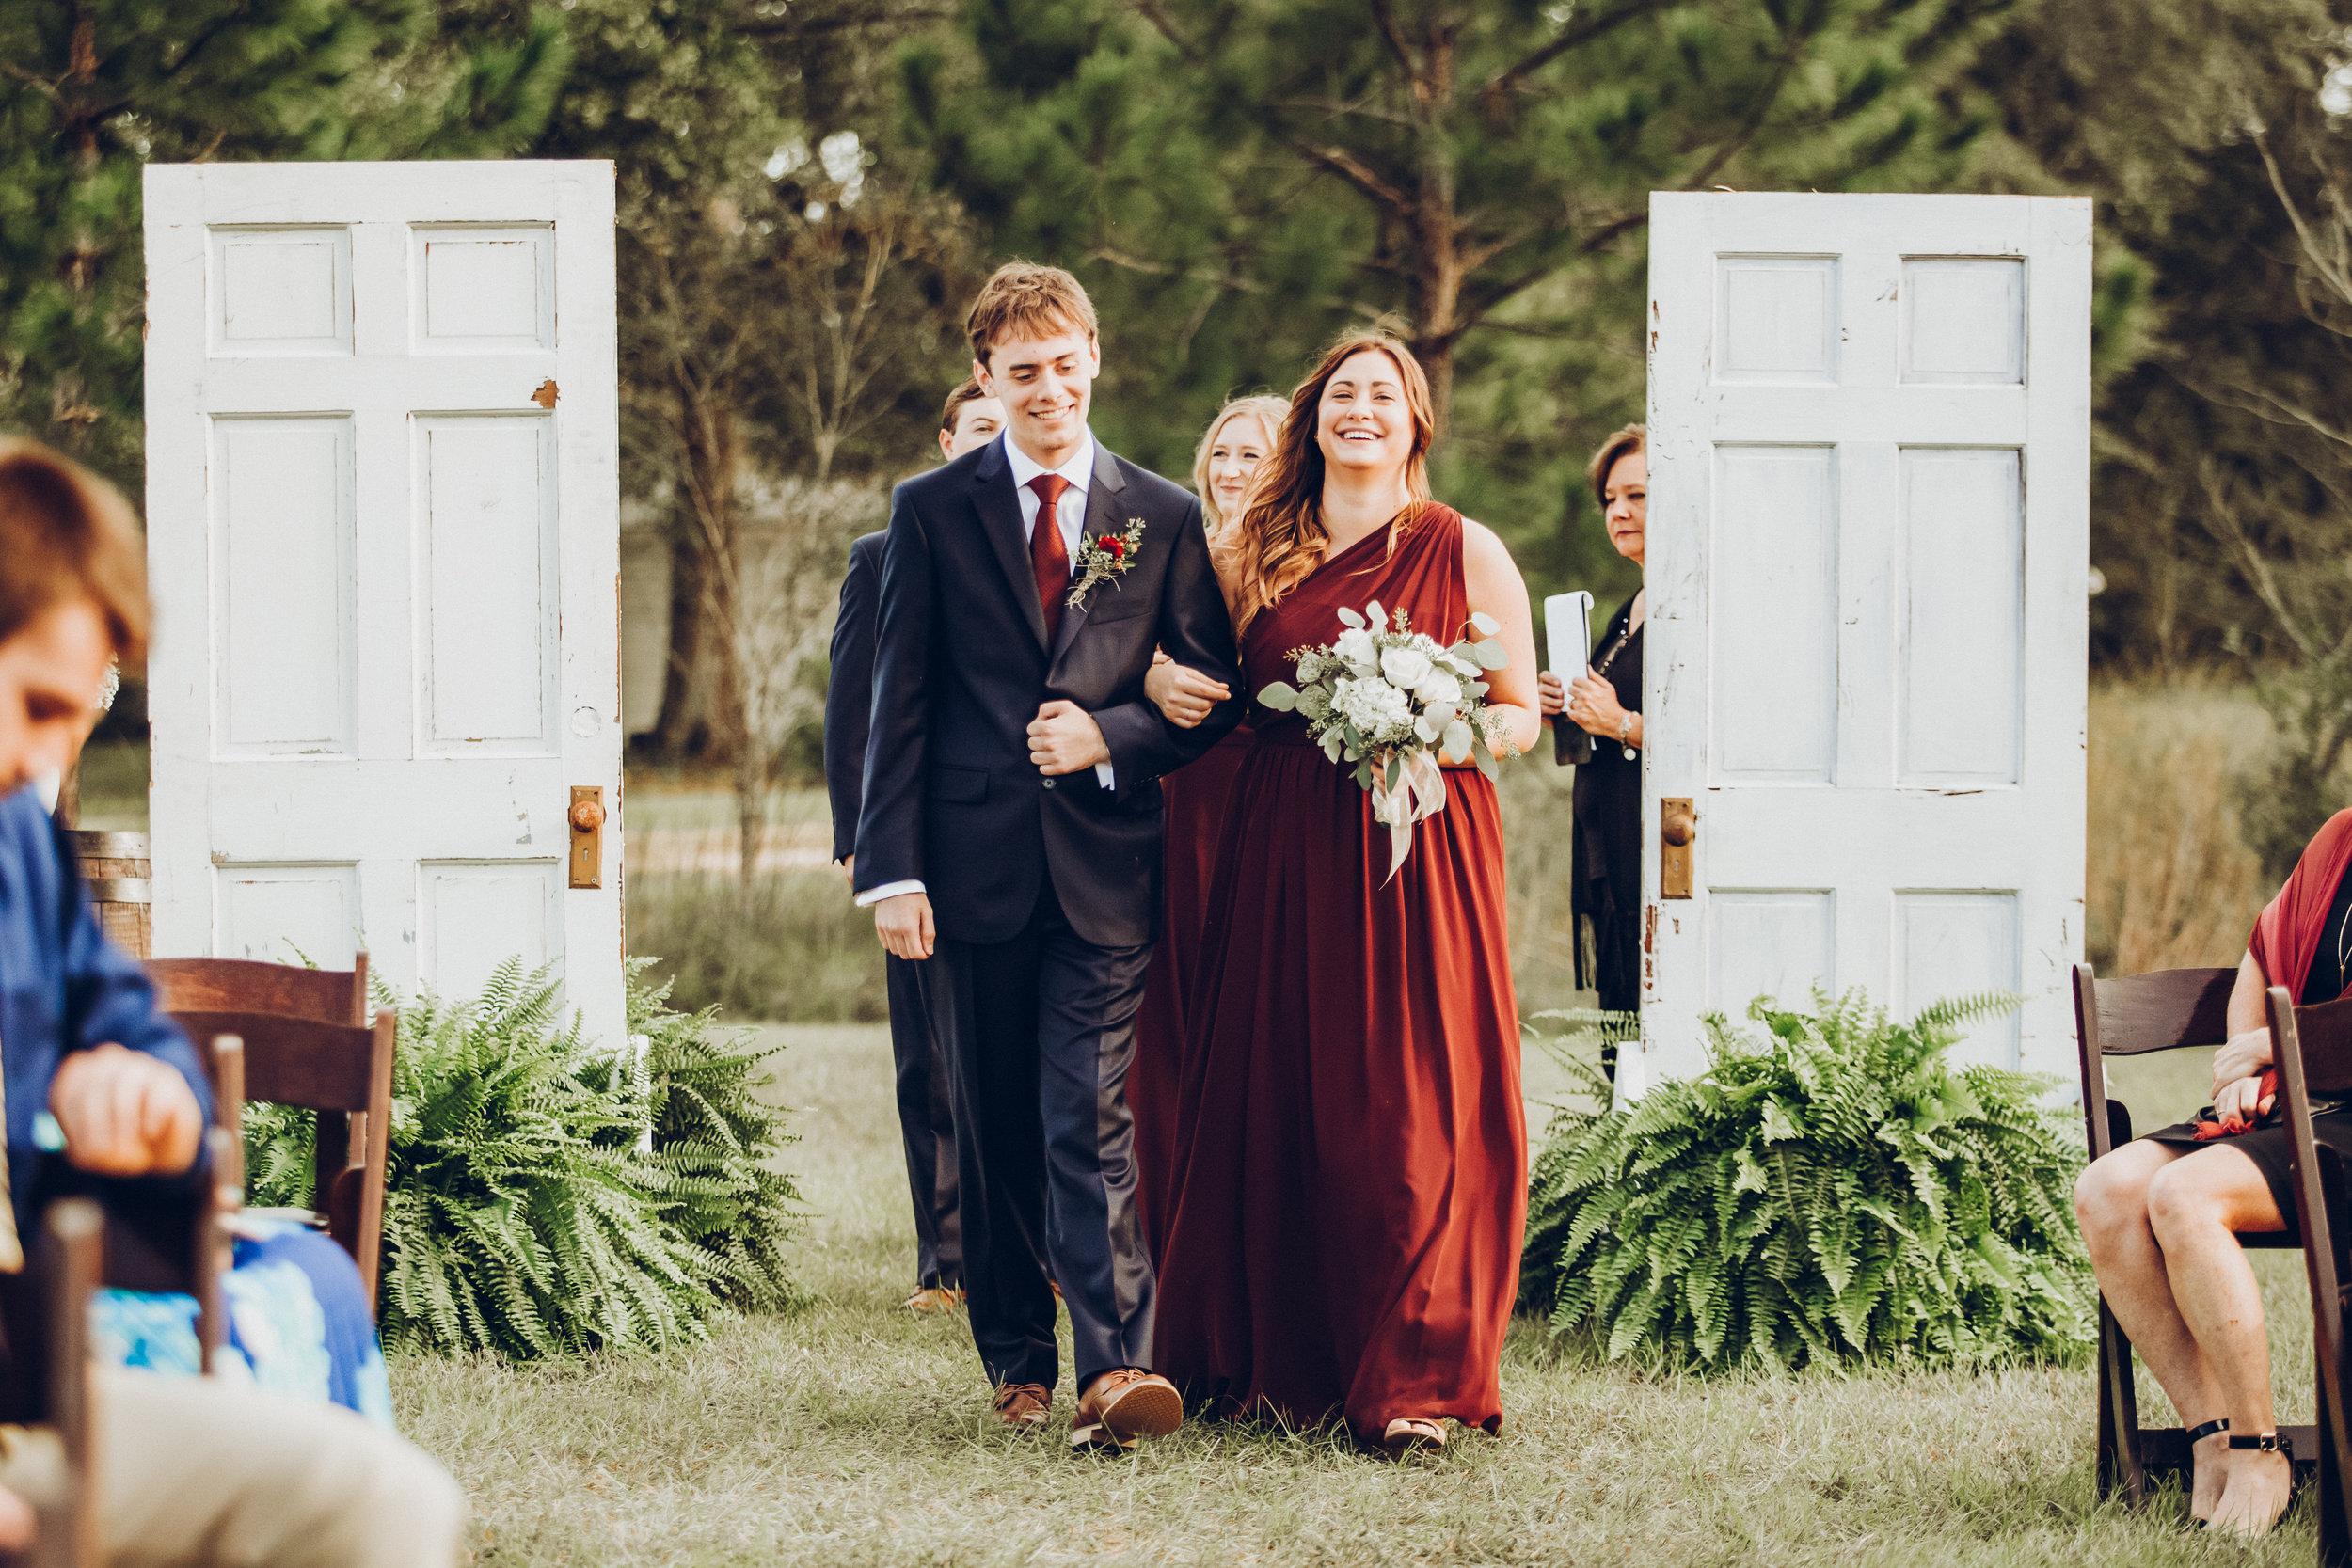 4. Ceremony - Romantic Backyard Farm Wedding - Lauren+Daniel 078.jpg